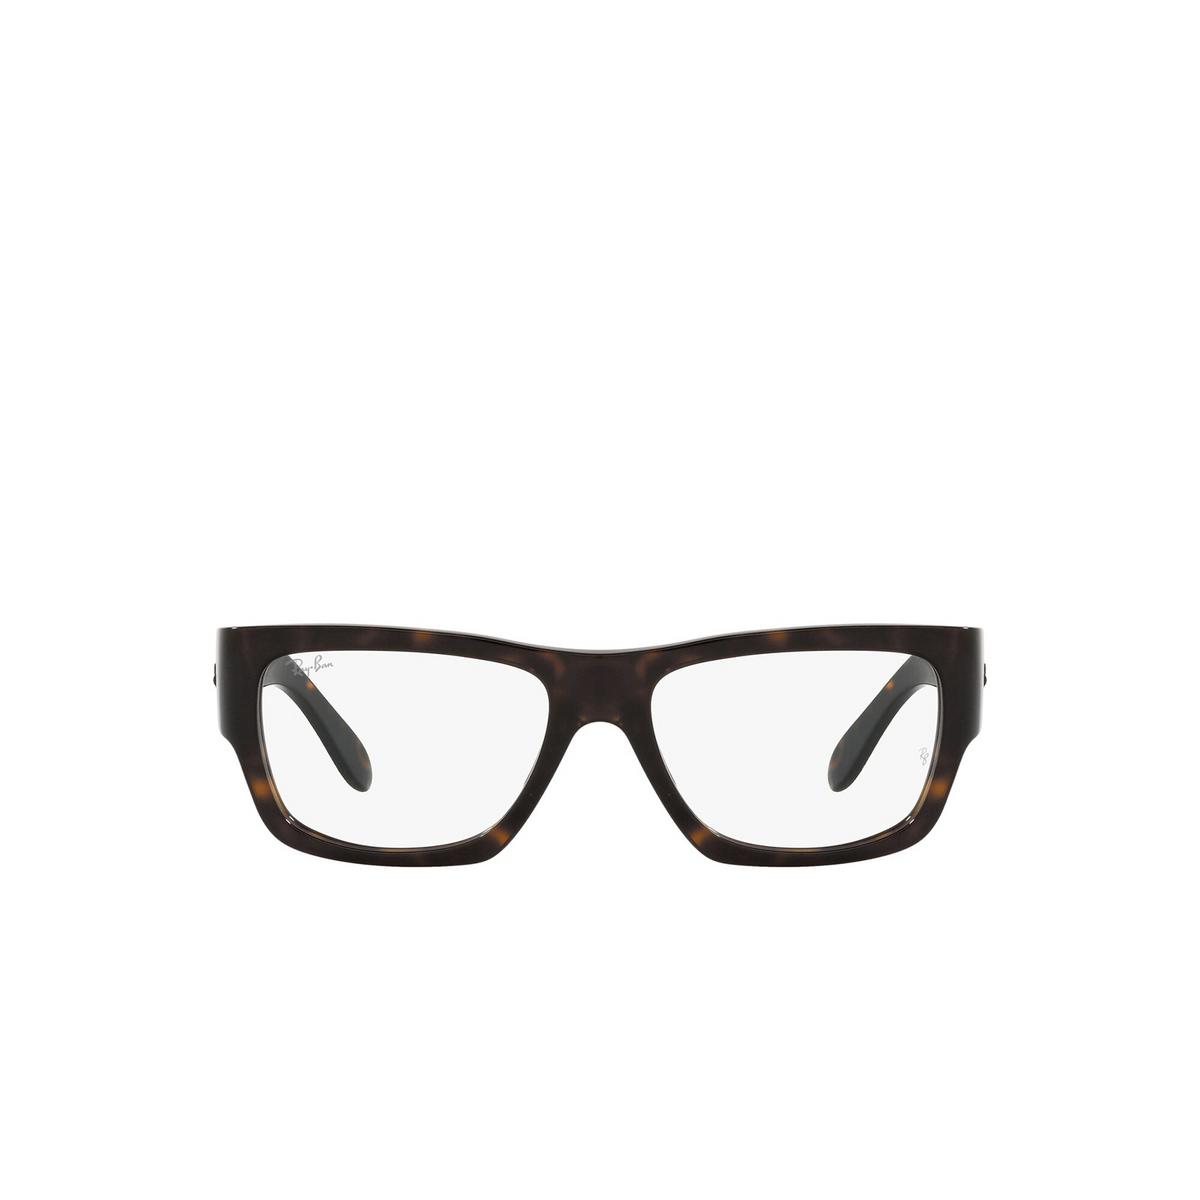 Ray-Ban® Square Eyeglasses: Nomad Wayfarer RX5487 color Havana 2012 - front view.